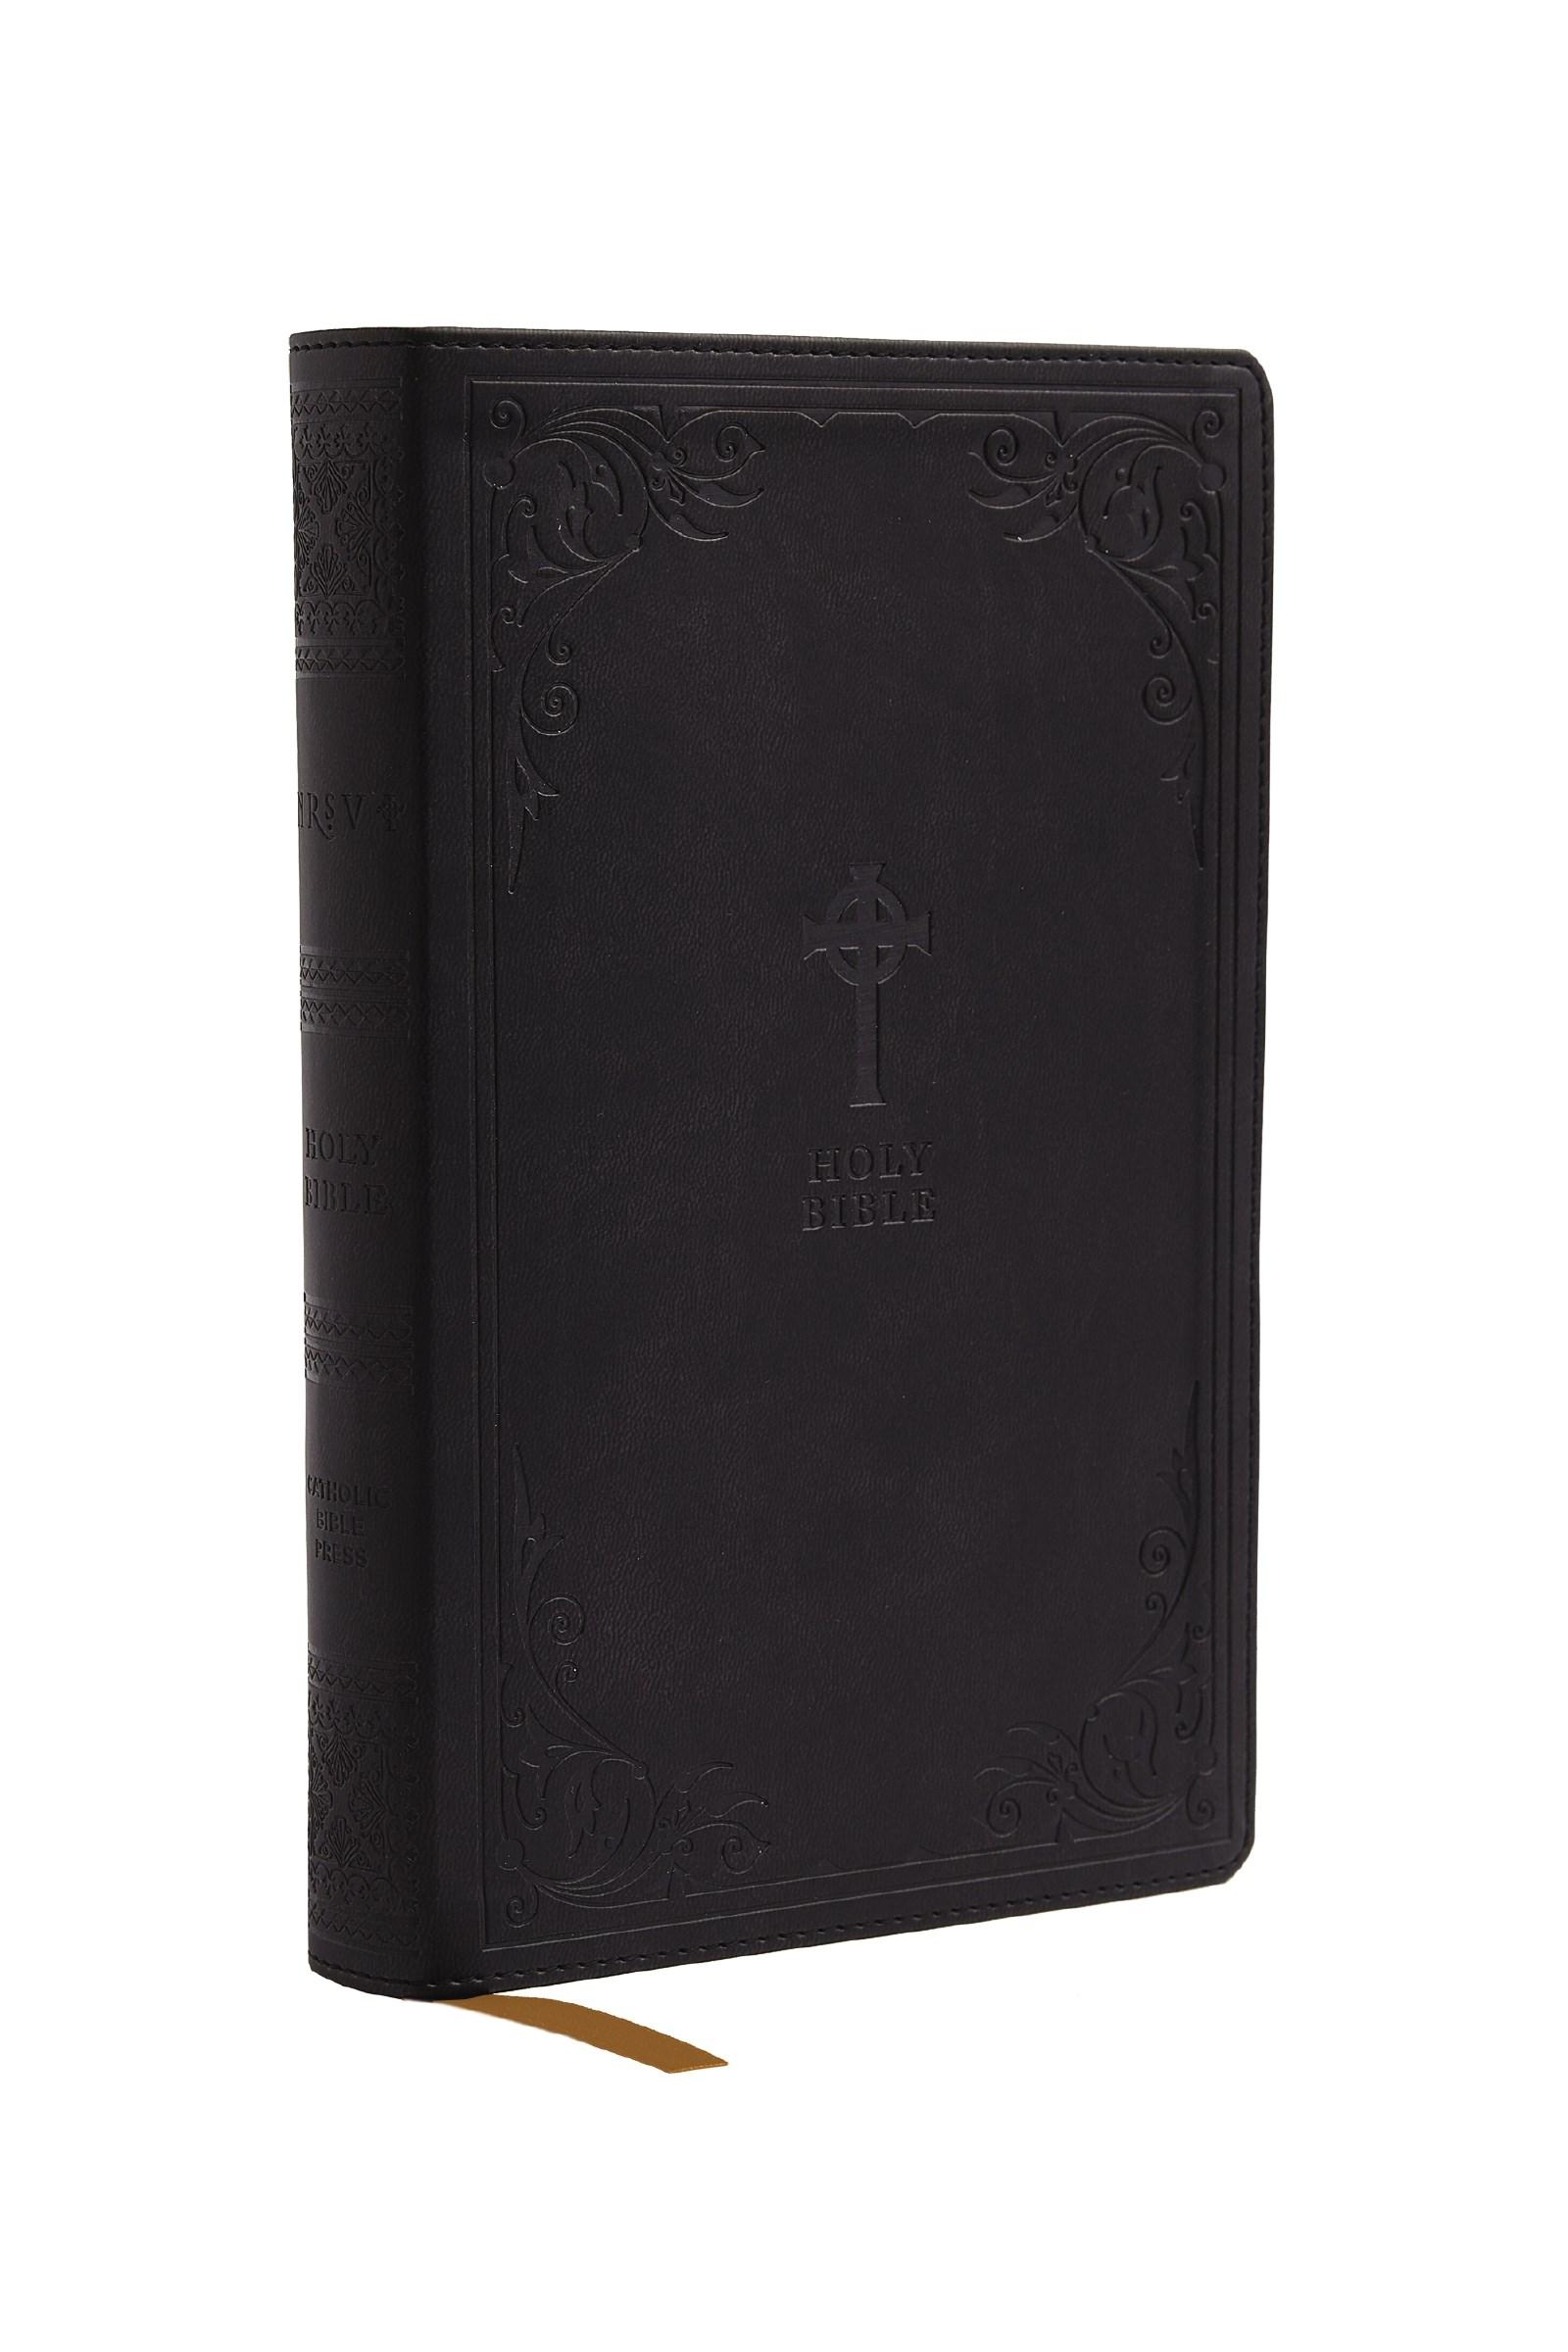 NRSV Catholic Gift Bible (Comfort Print)-Black Leathersoft